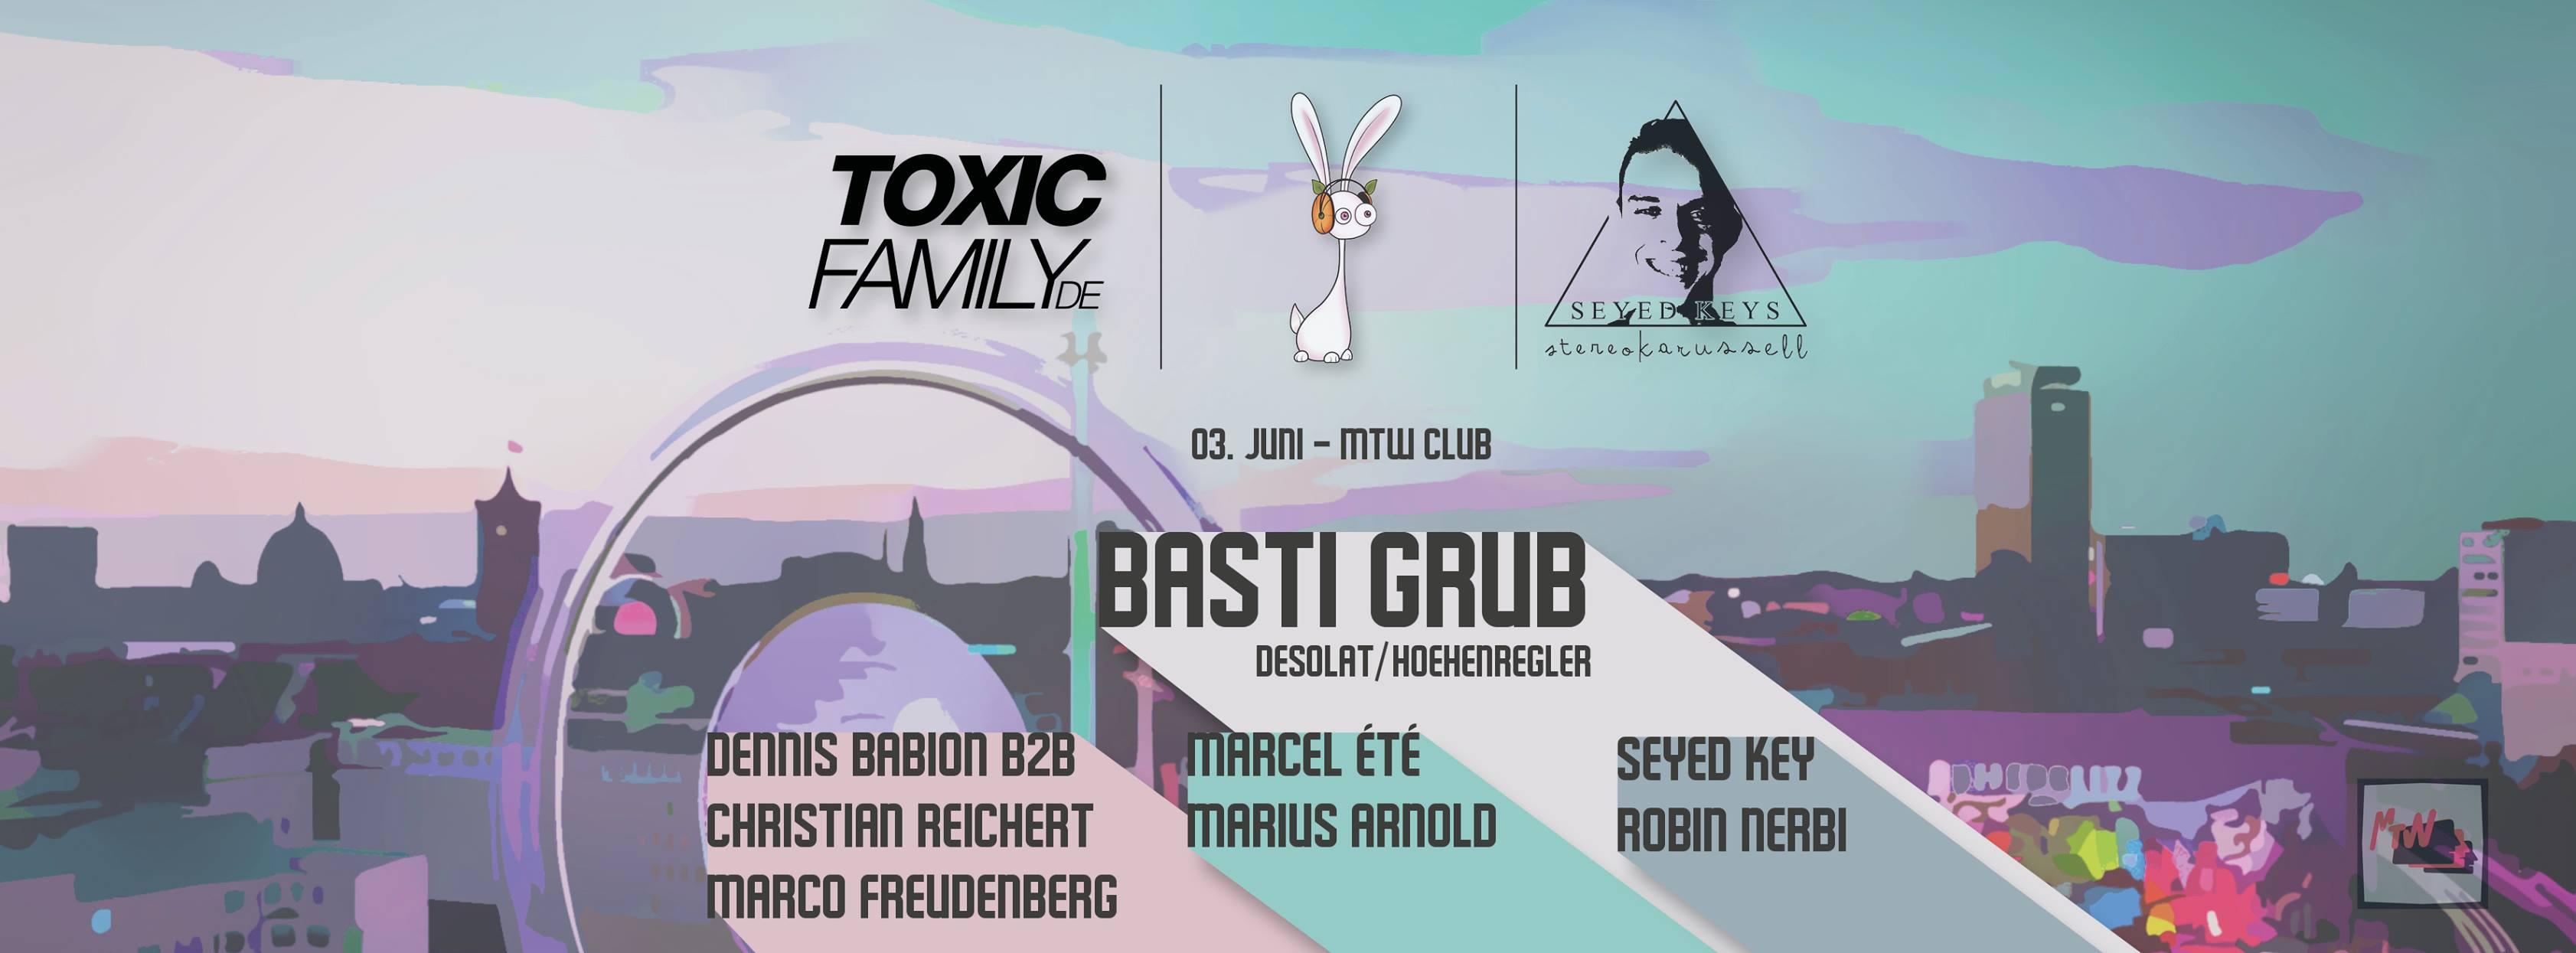 2017-06-03-Marco Freudenberg-Toxic-Family-Basti-Grub